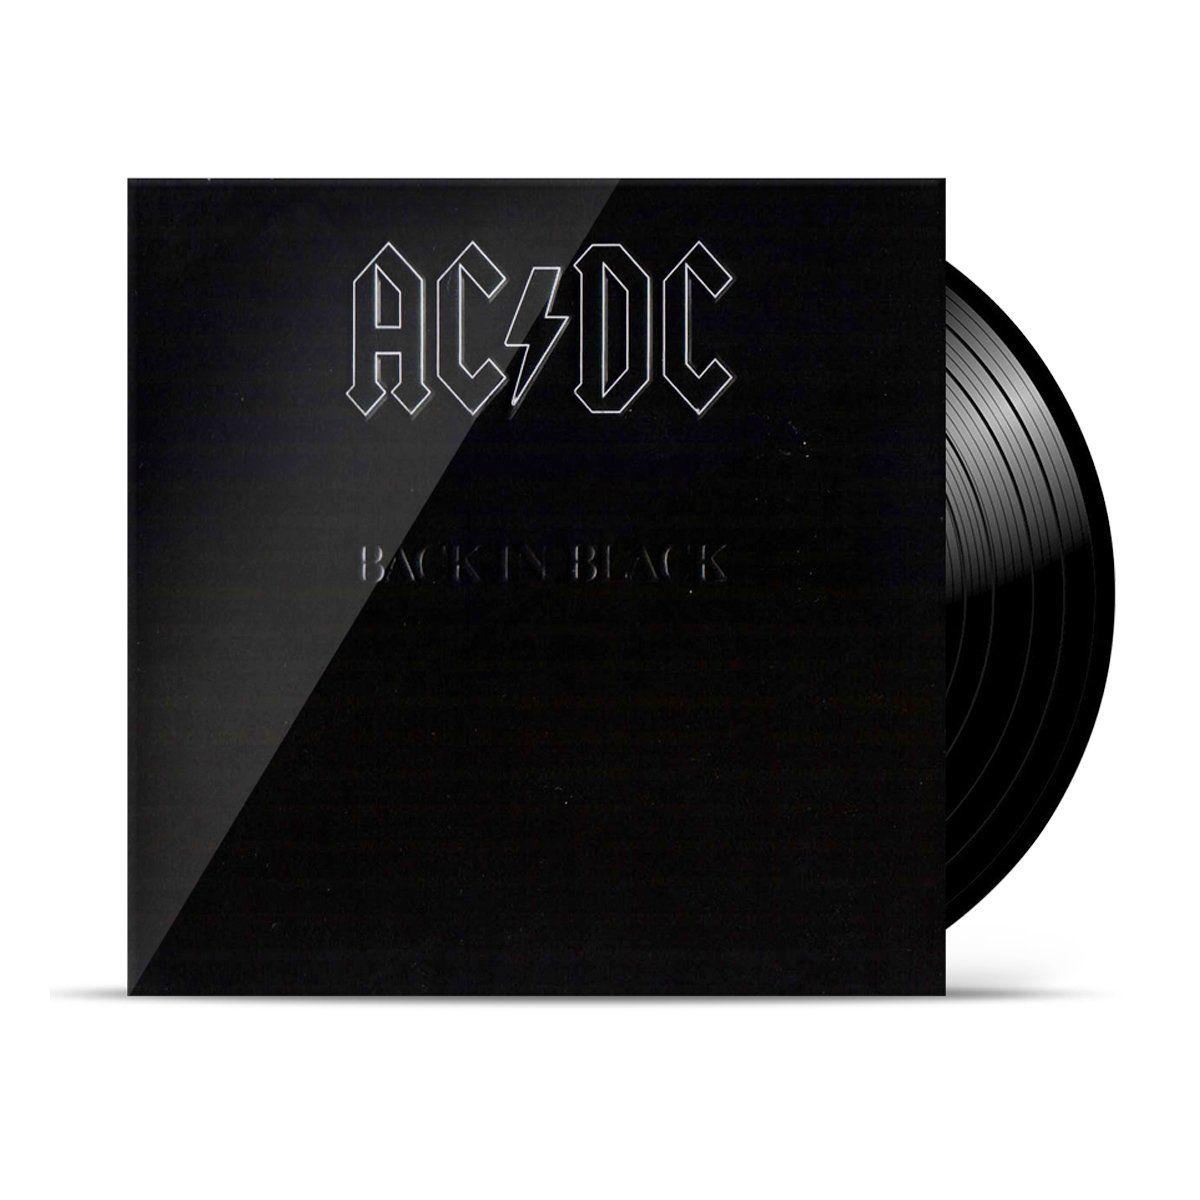 LP AC/DC Back in Black